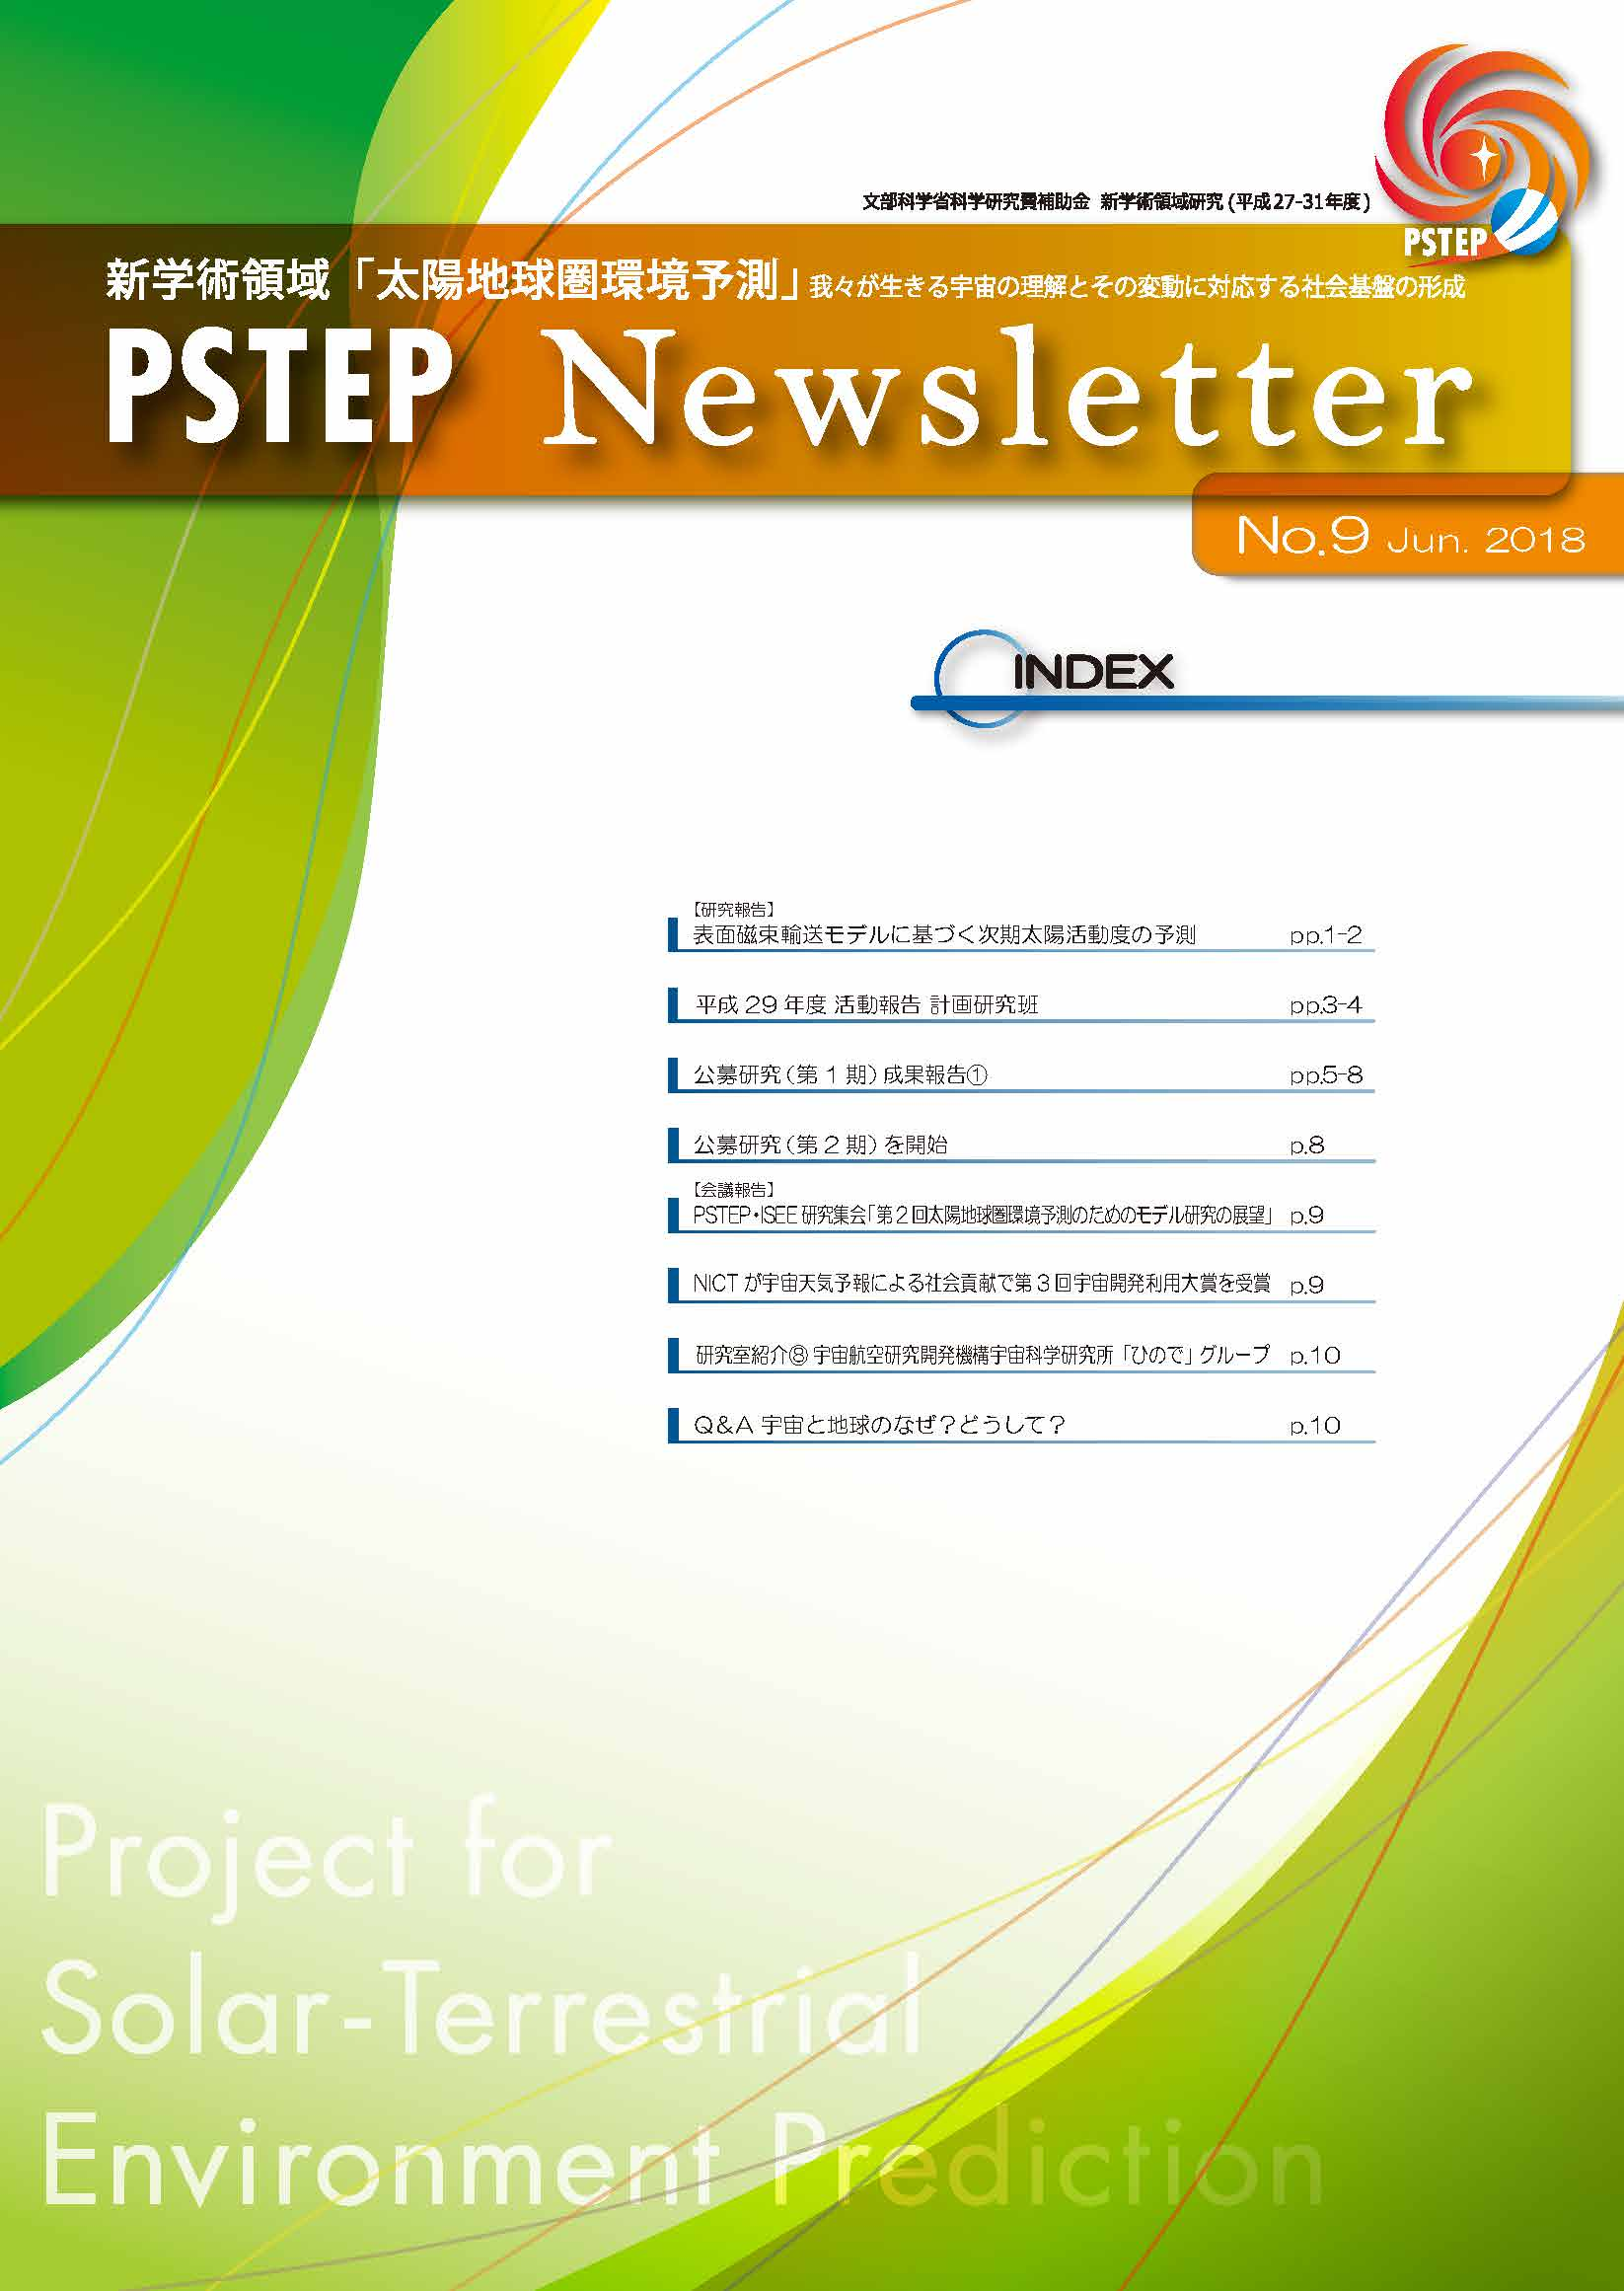 pstep newsletter no 9の発行 新学術領域研究 太陽地球圏環境予測